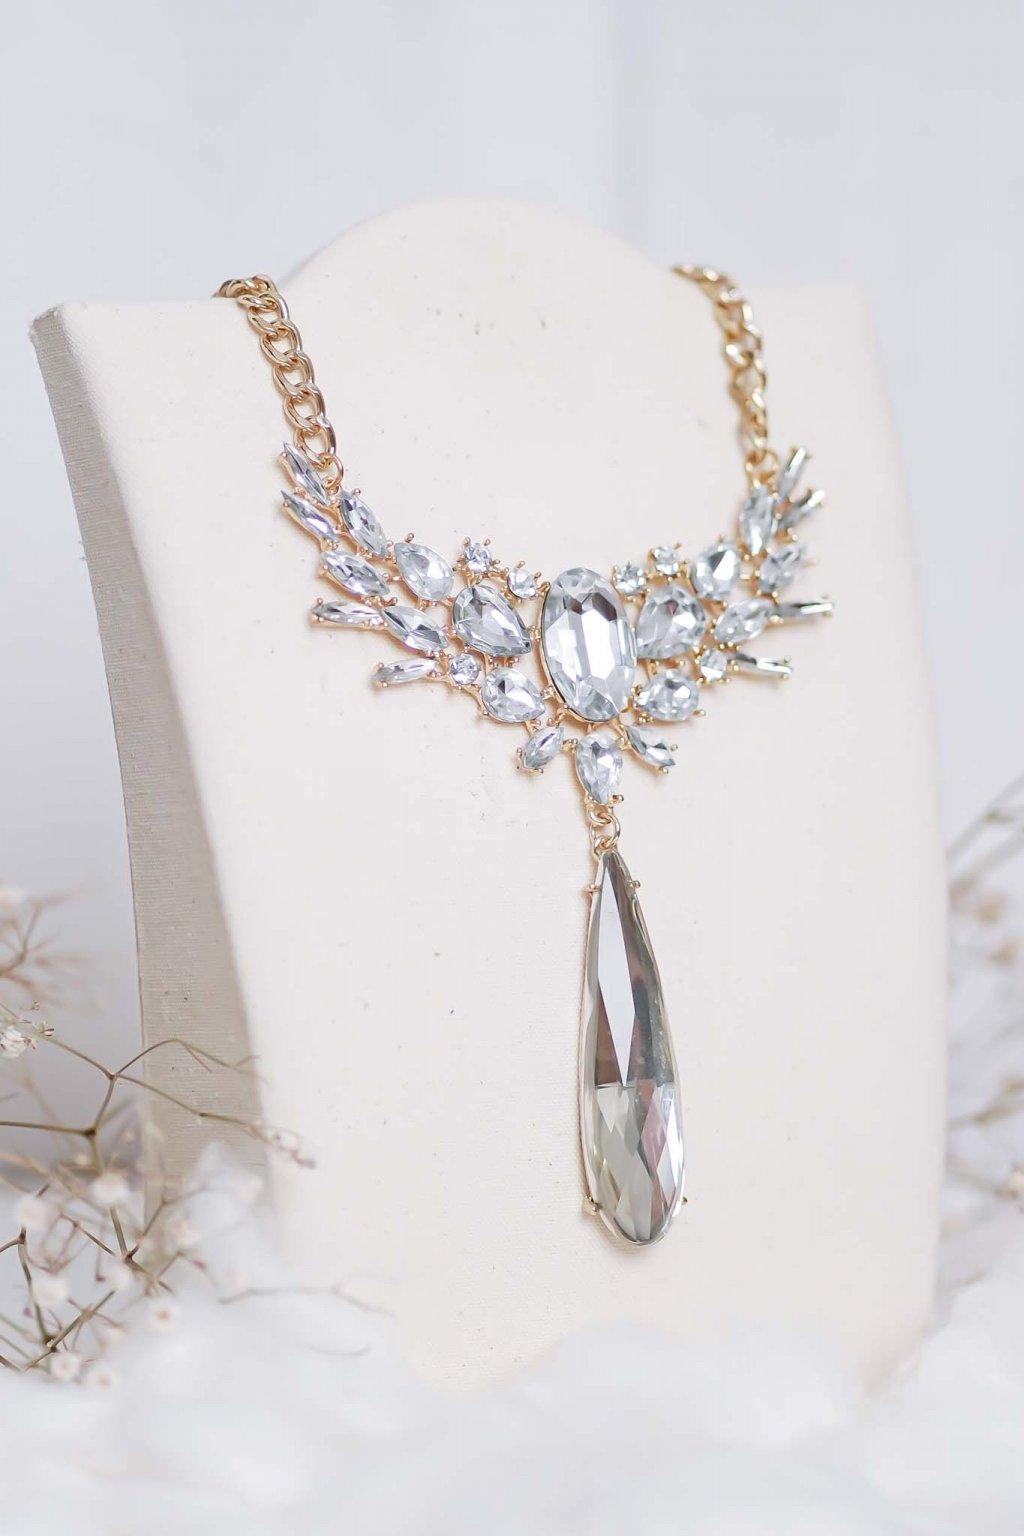 náhrdelník, šperk, spoločenská náhrdelník, náhrdelník na bežný deň, výrazný náhrdelník, jemný náhrdelník, šperky, náhrdelník na ples, svadbu, stužkovú 84